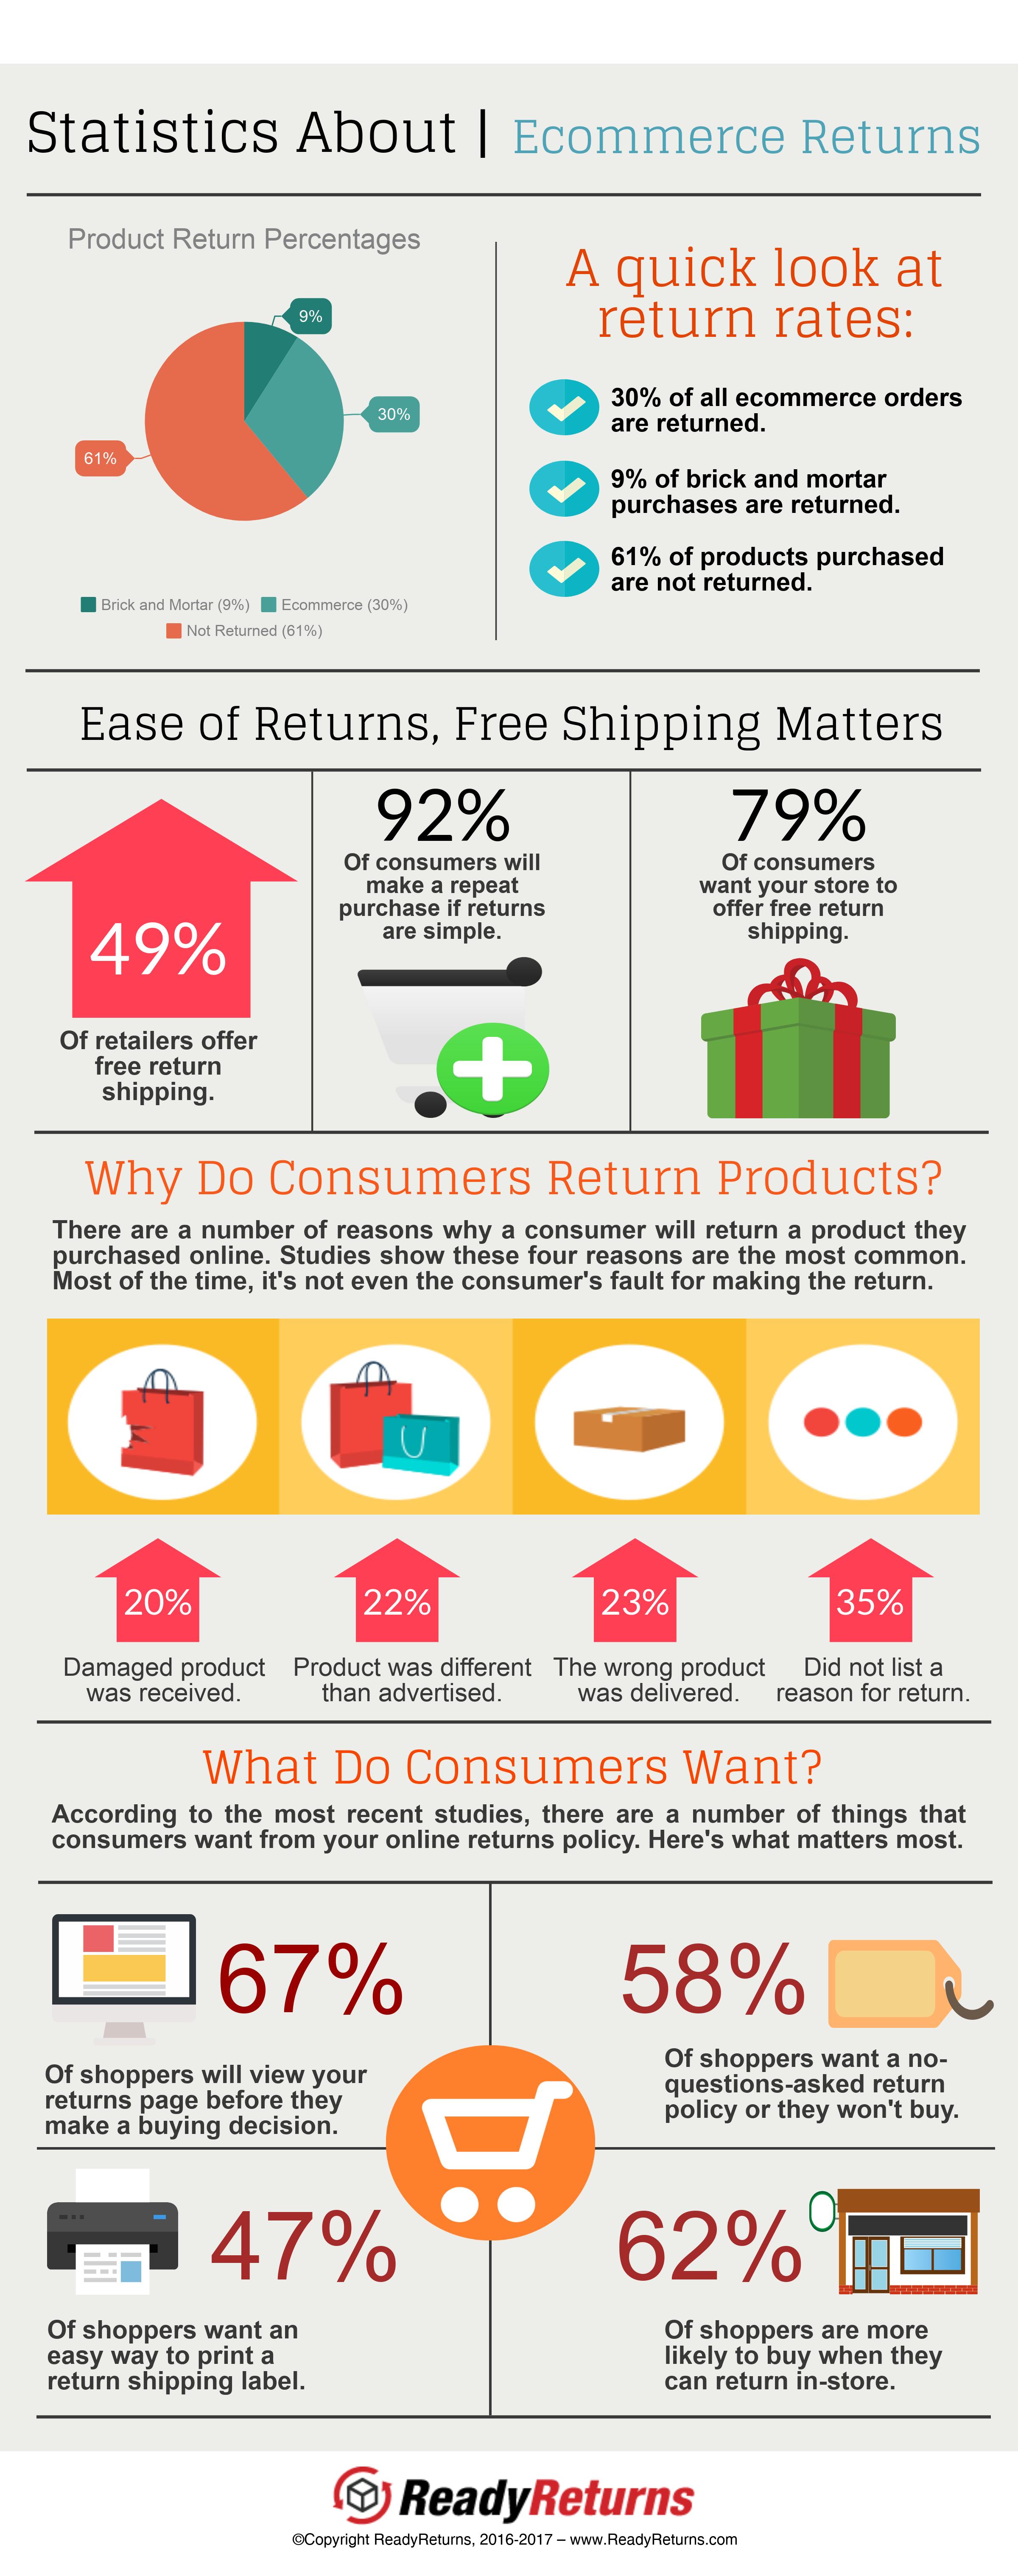 Ecommerce Returns Infographic - ReadyReturns.com.png